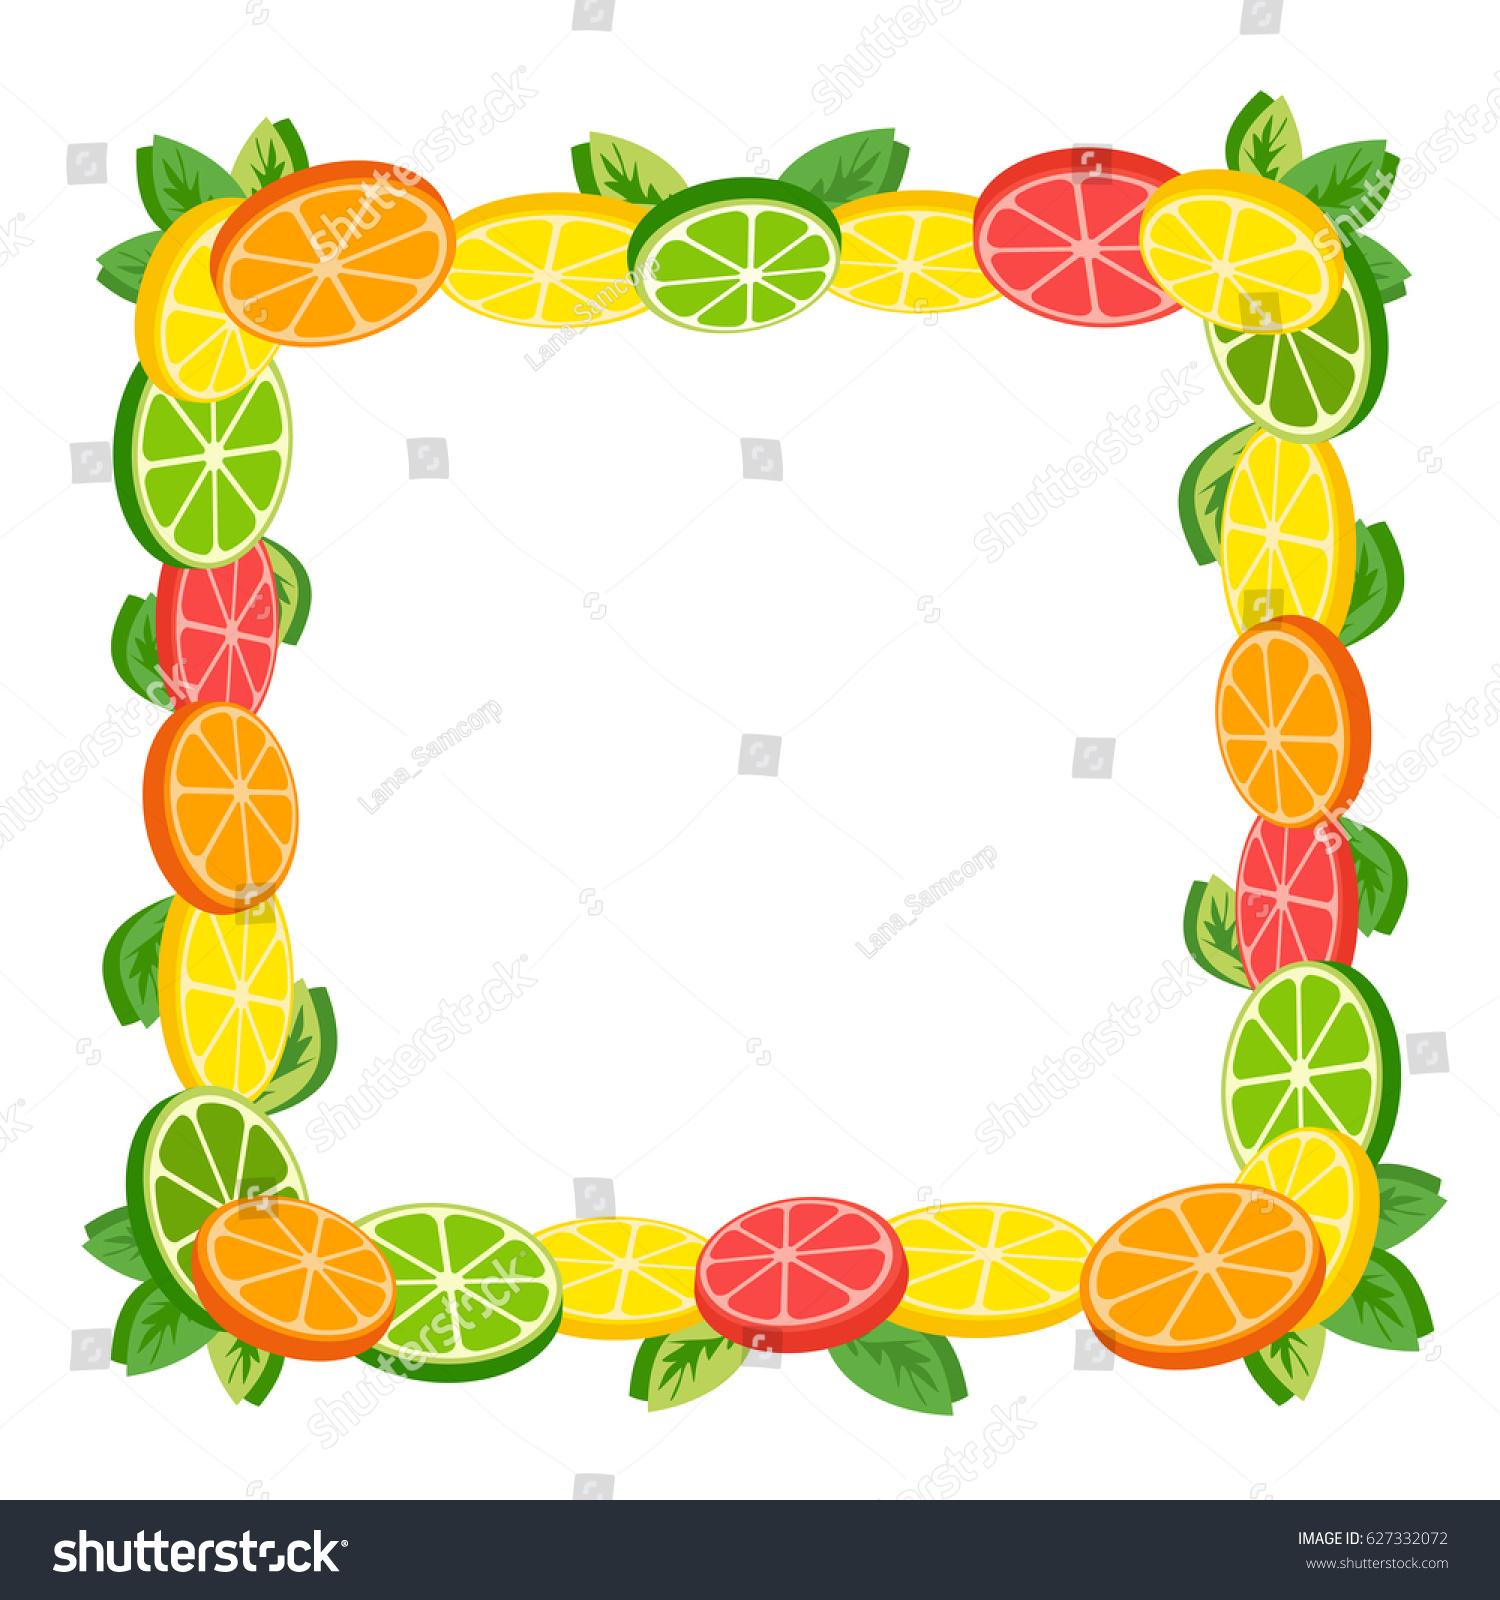 citrus fruits decorative background sliced lemon stock illustration rh shutterstock com